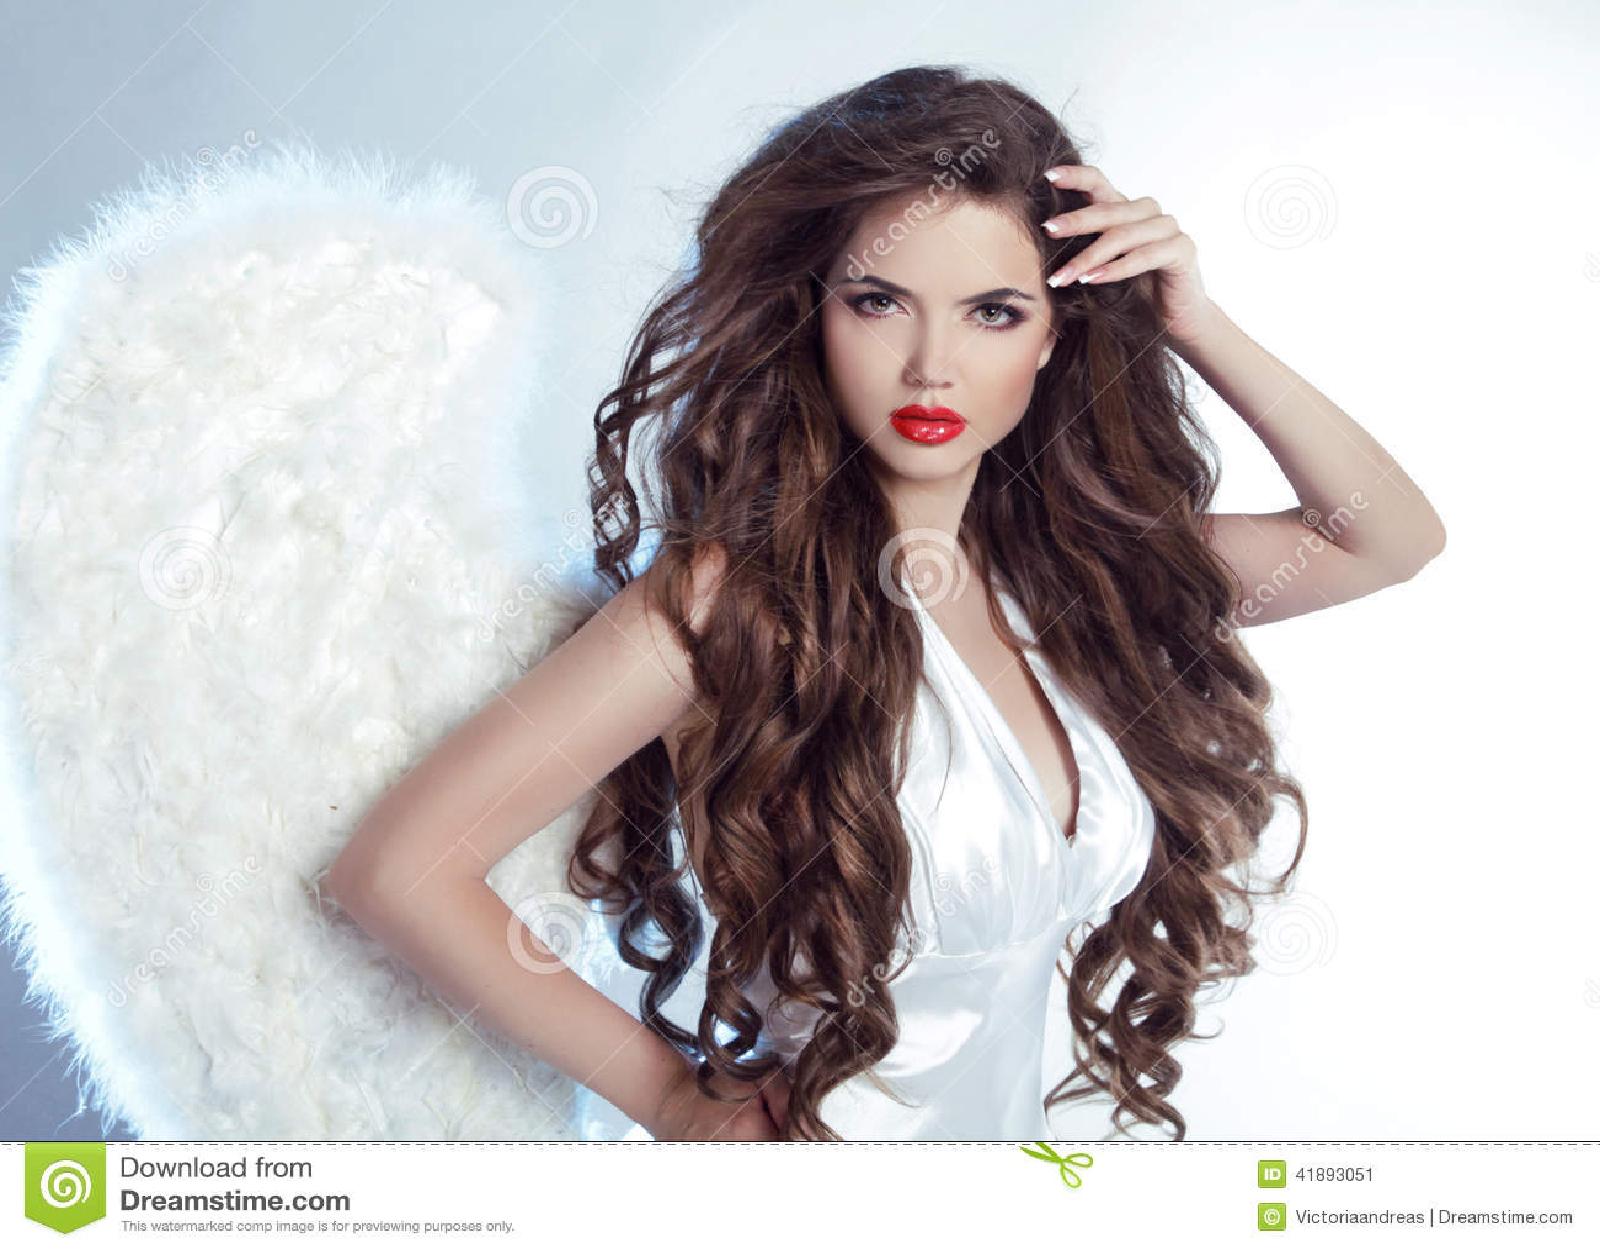 pelo largo putas hermoso